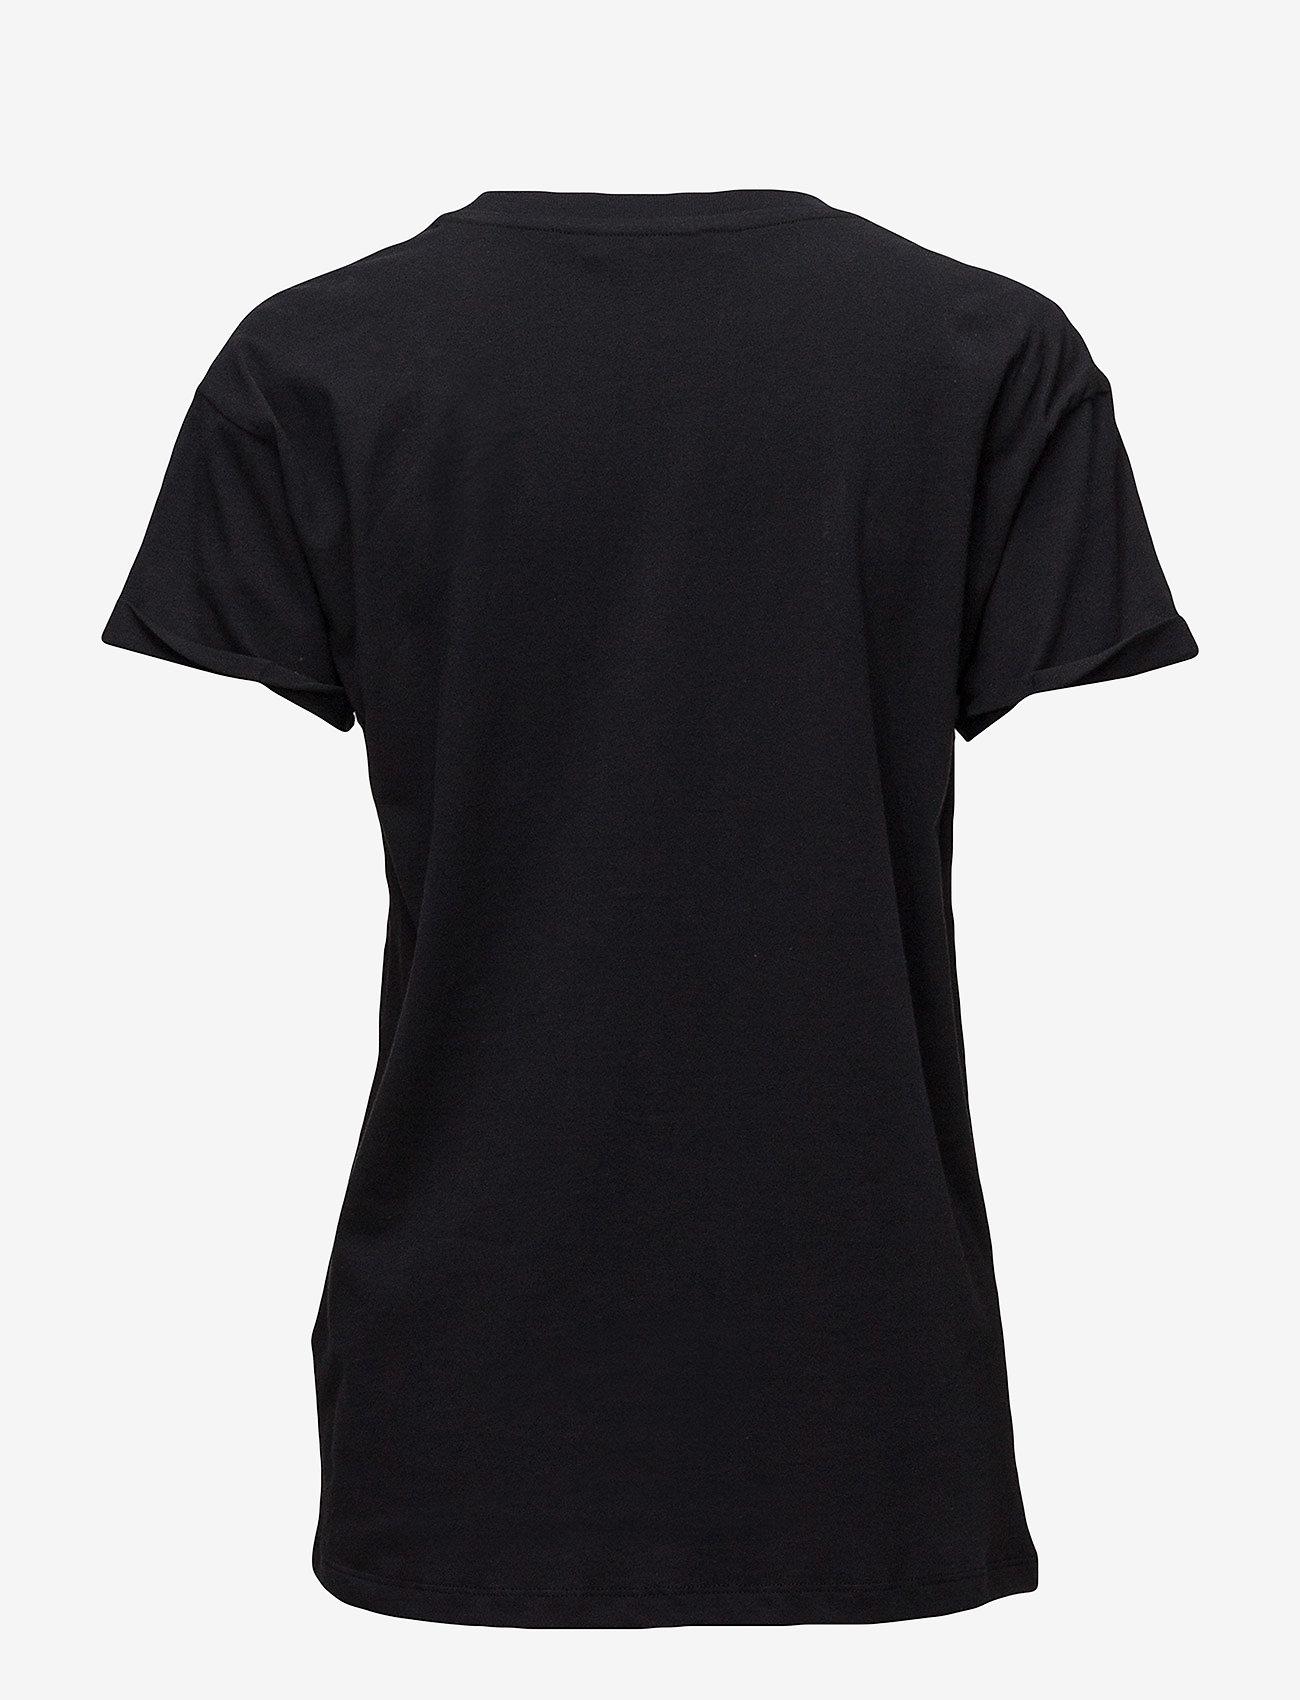 Gestuz - Hawaii tee HS18 - printti t-paidat - black